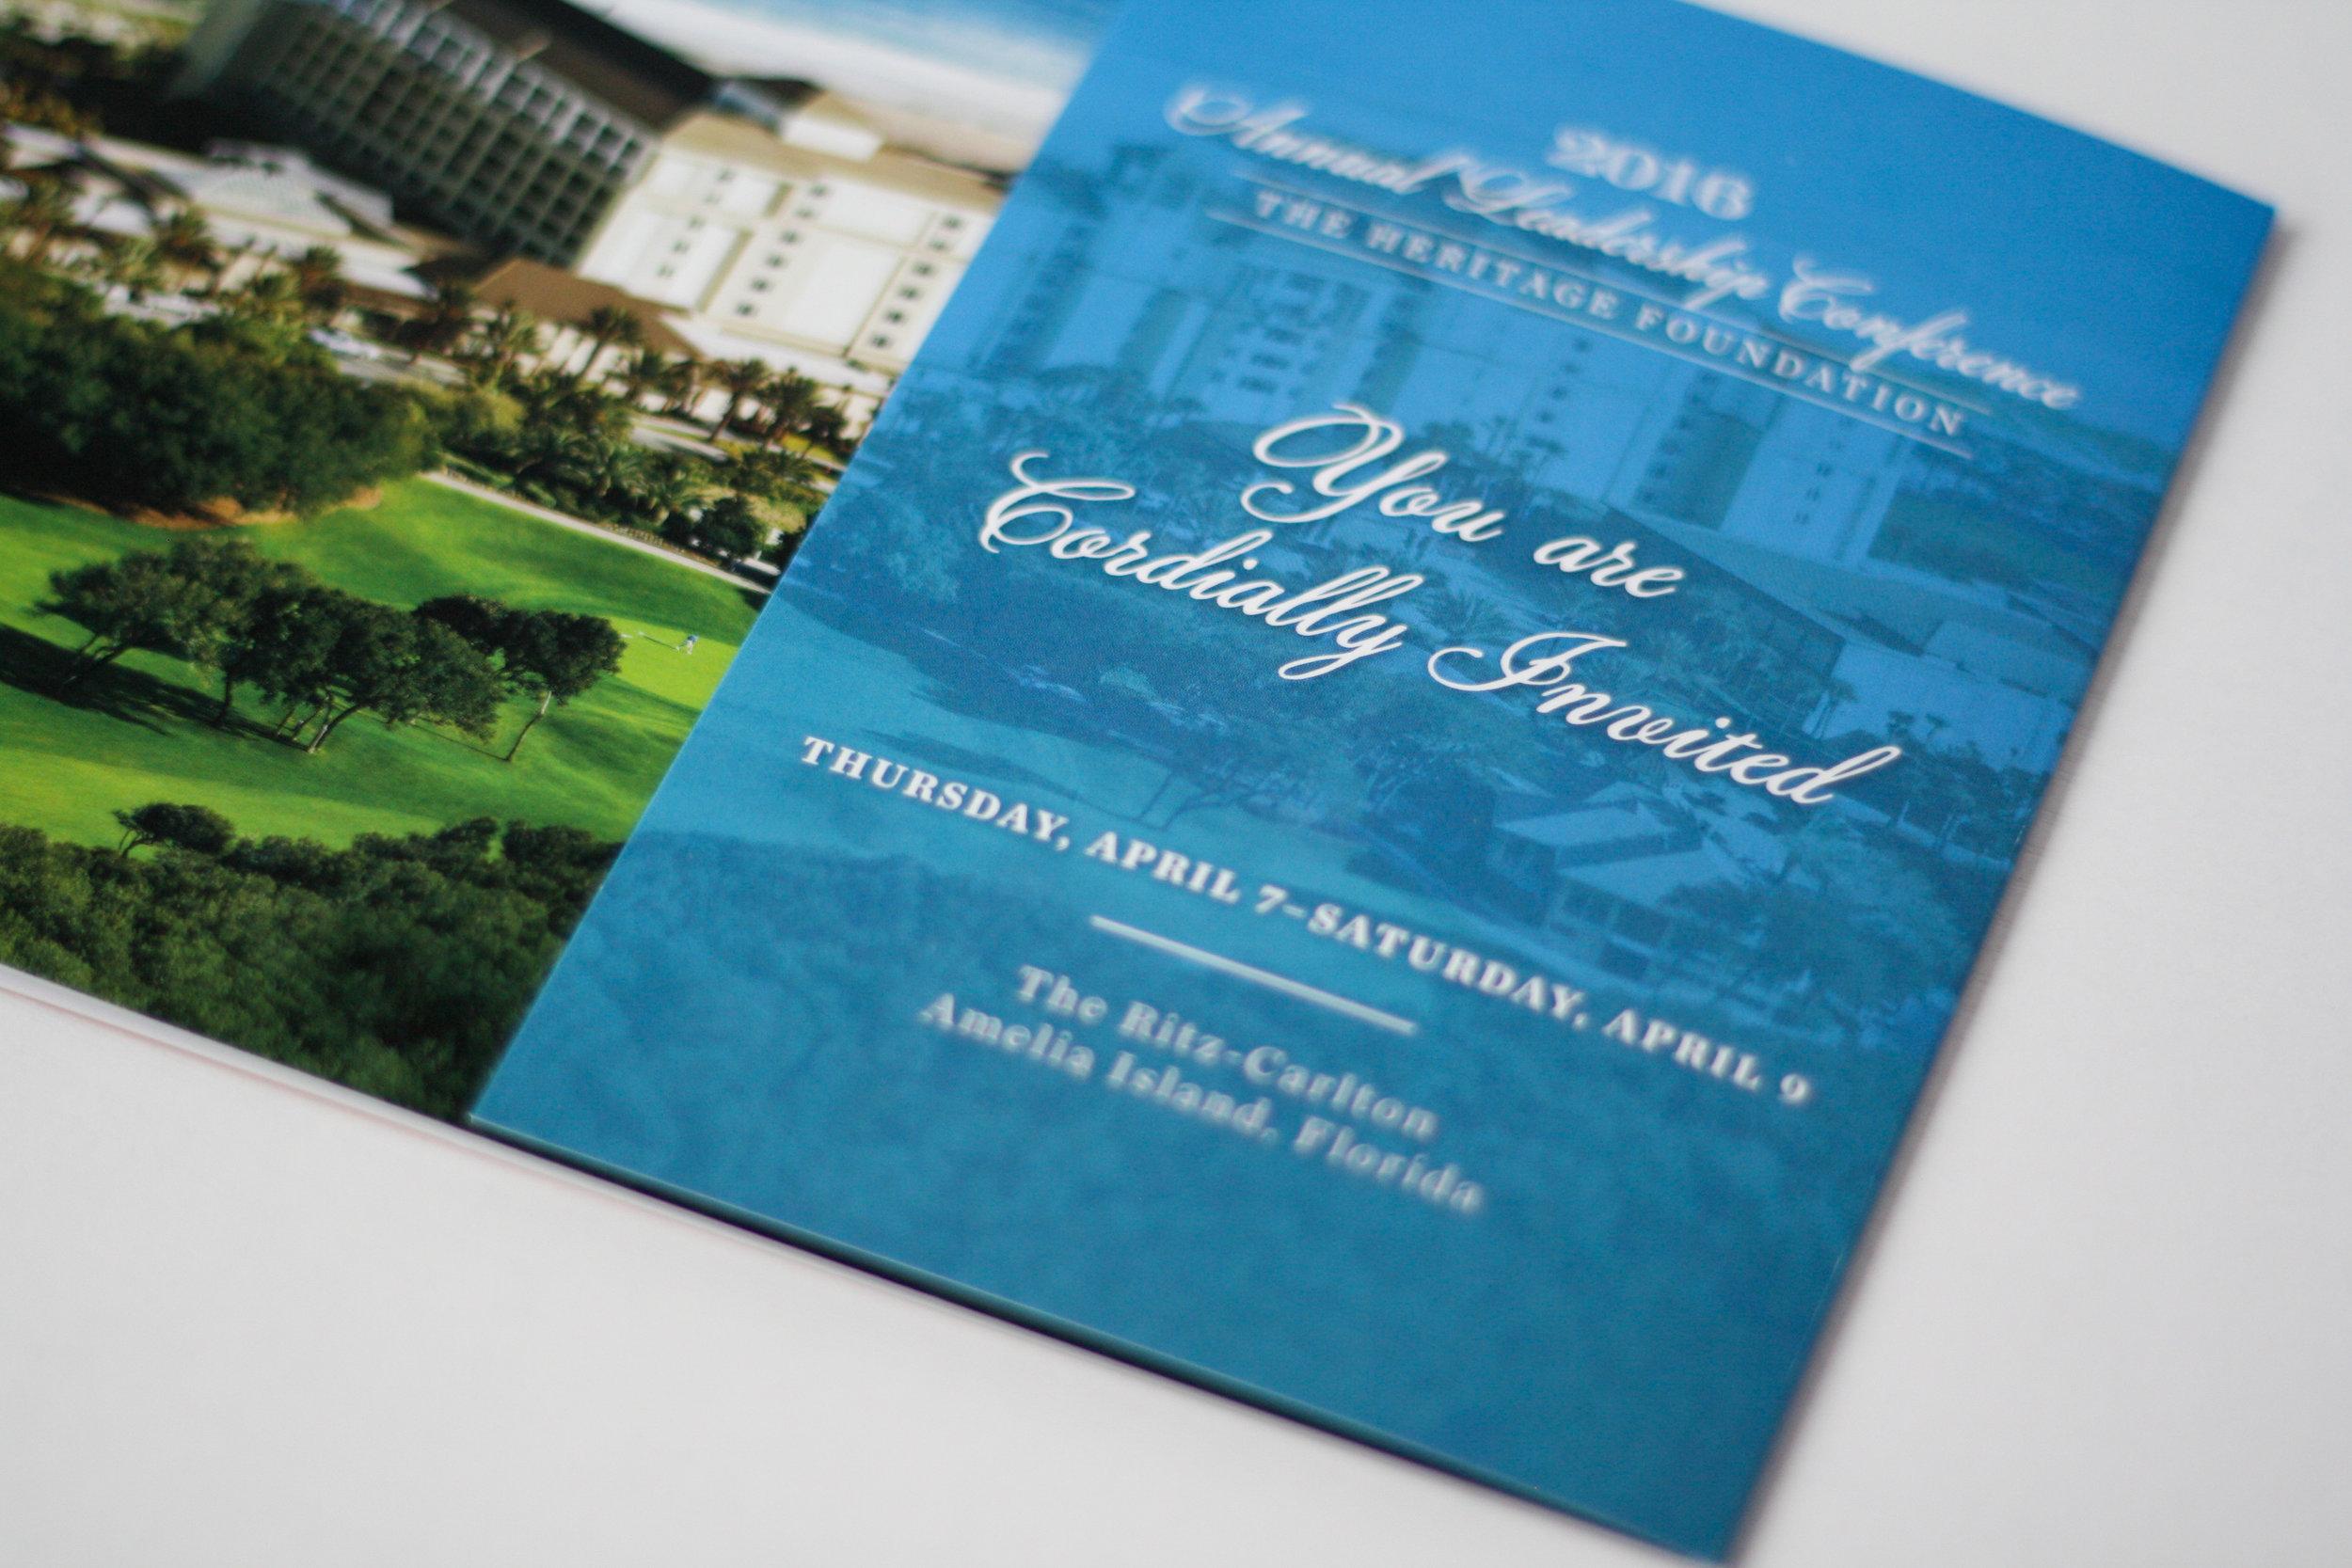 Annual Leadership Conference Invitation | Casi Long Design | casilong.com:portfolio | #casilongdesign #fearlesspursuit 7.jpg